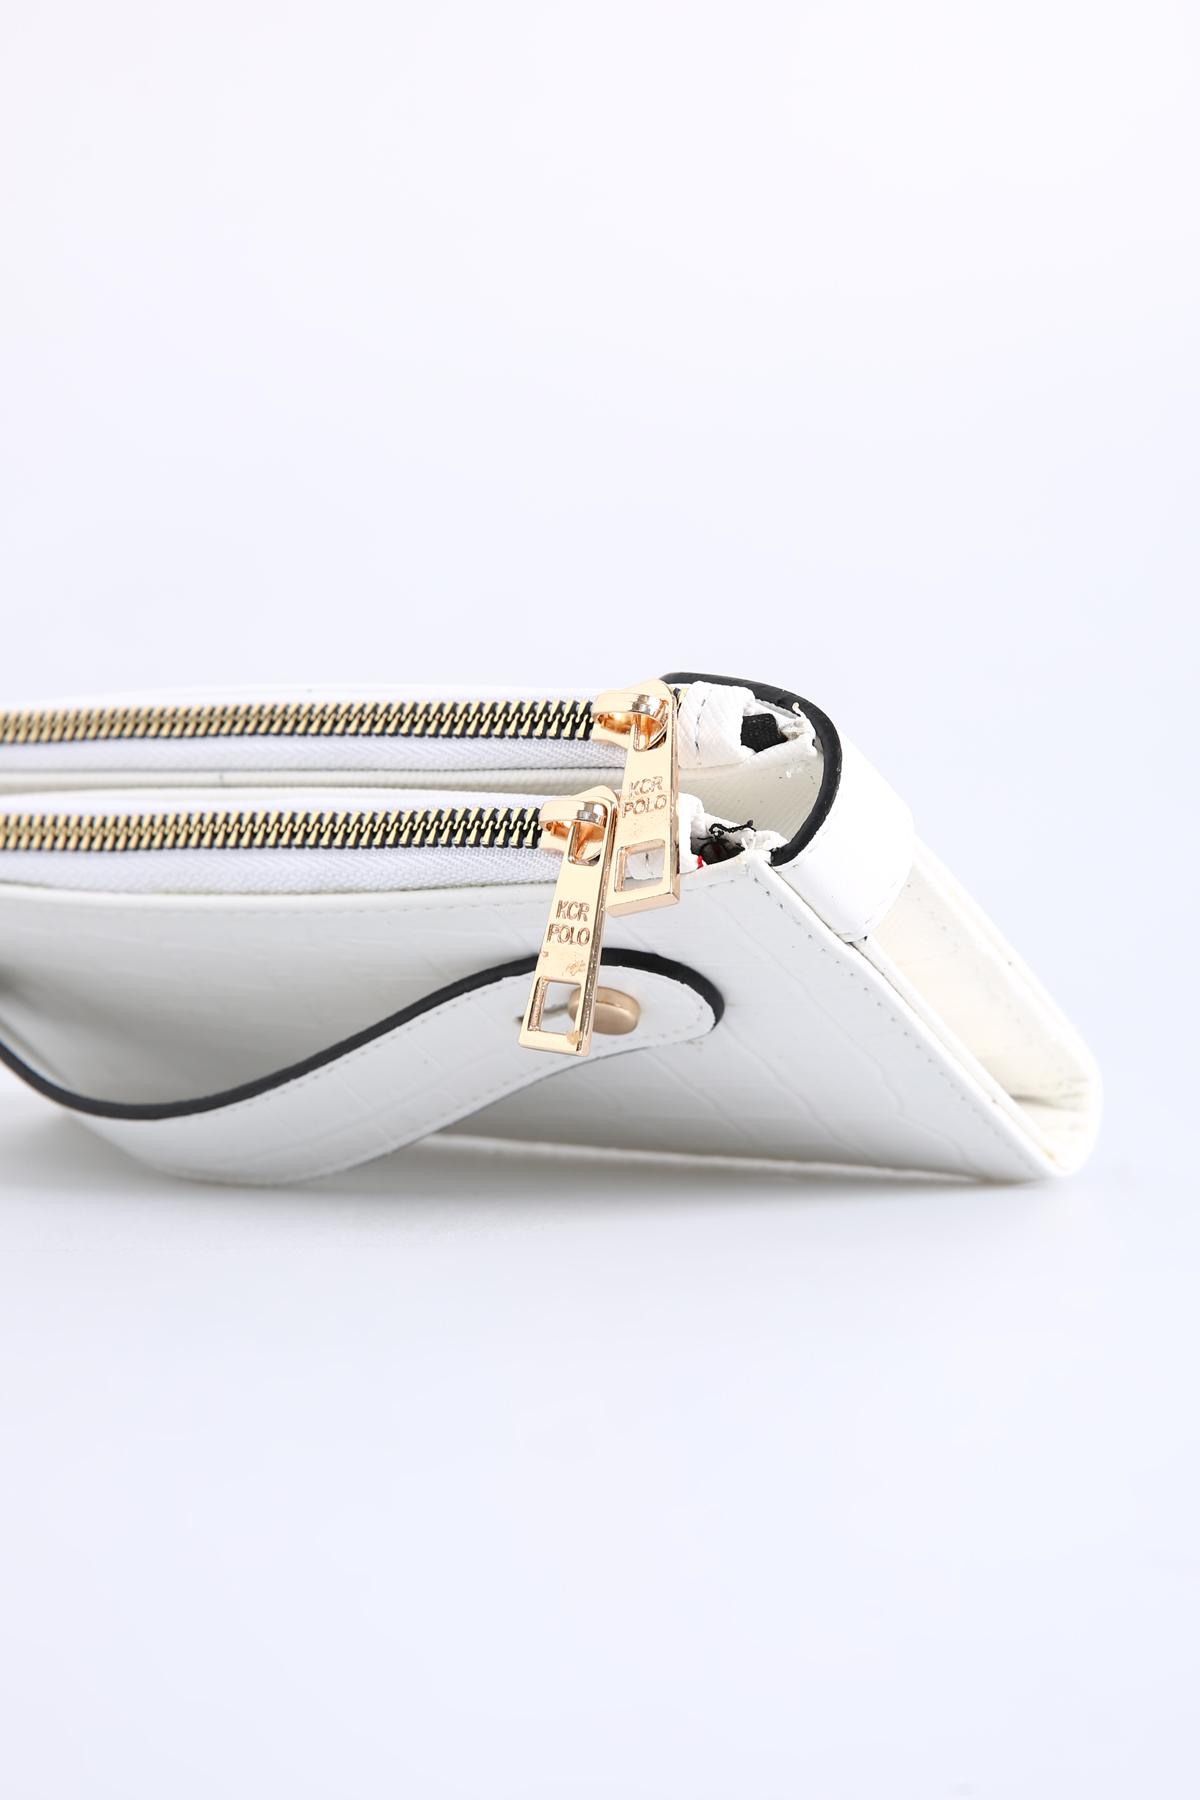 Lined Zippered Snakeskin Patterned Wallet